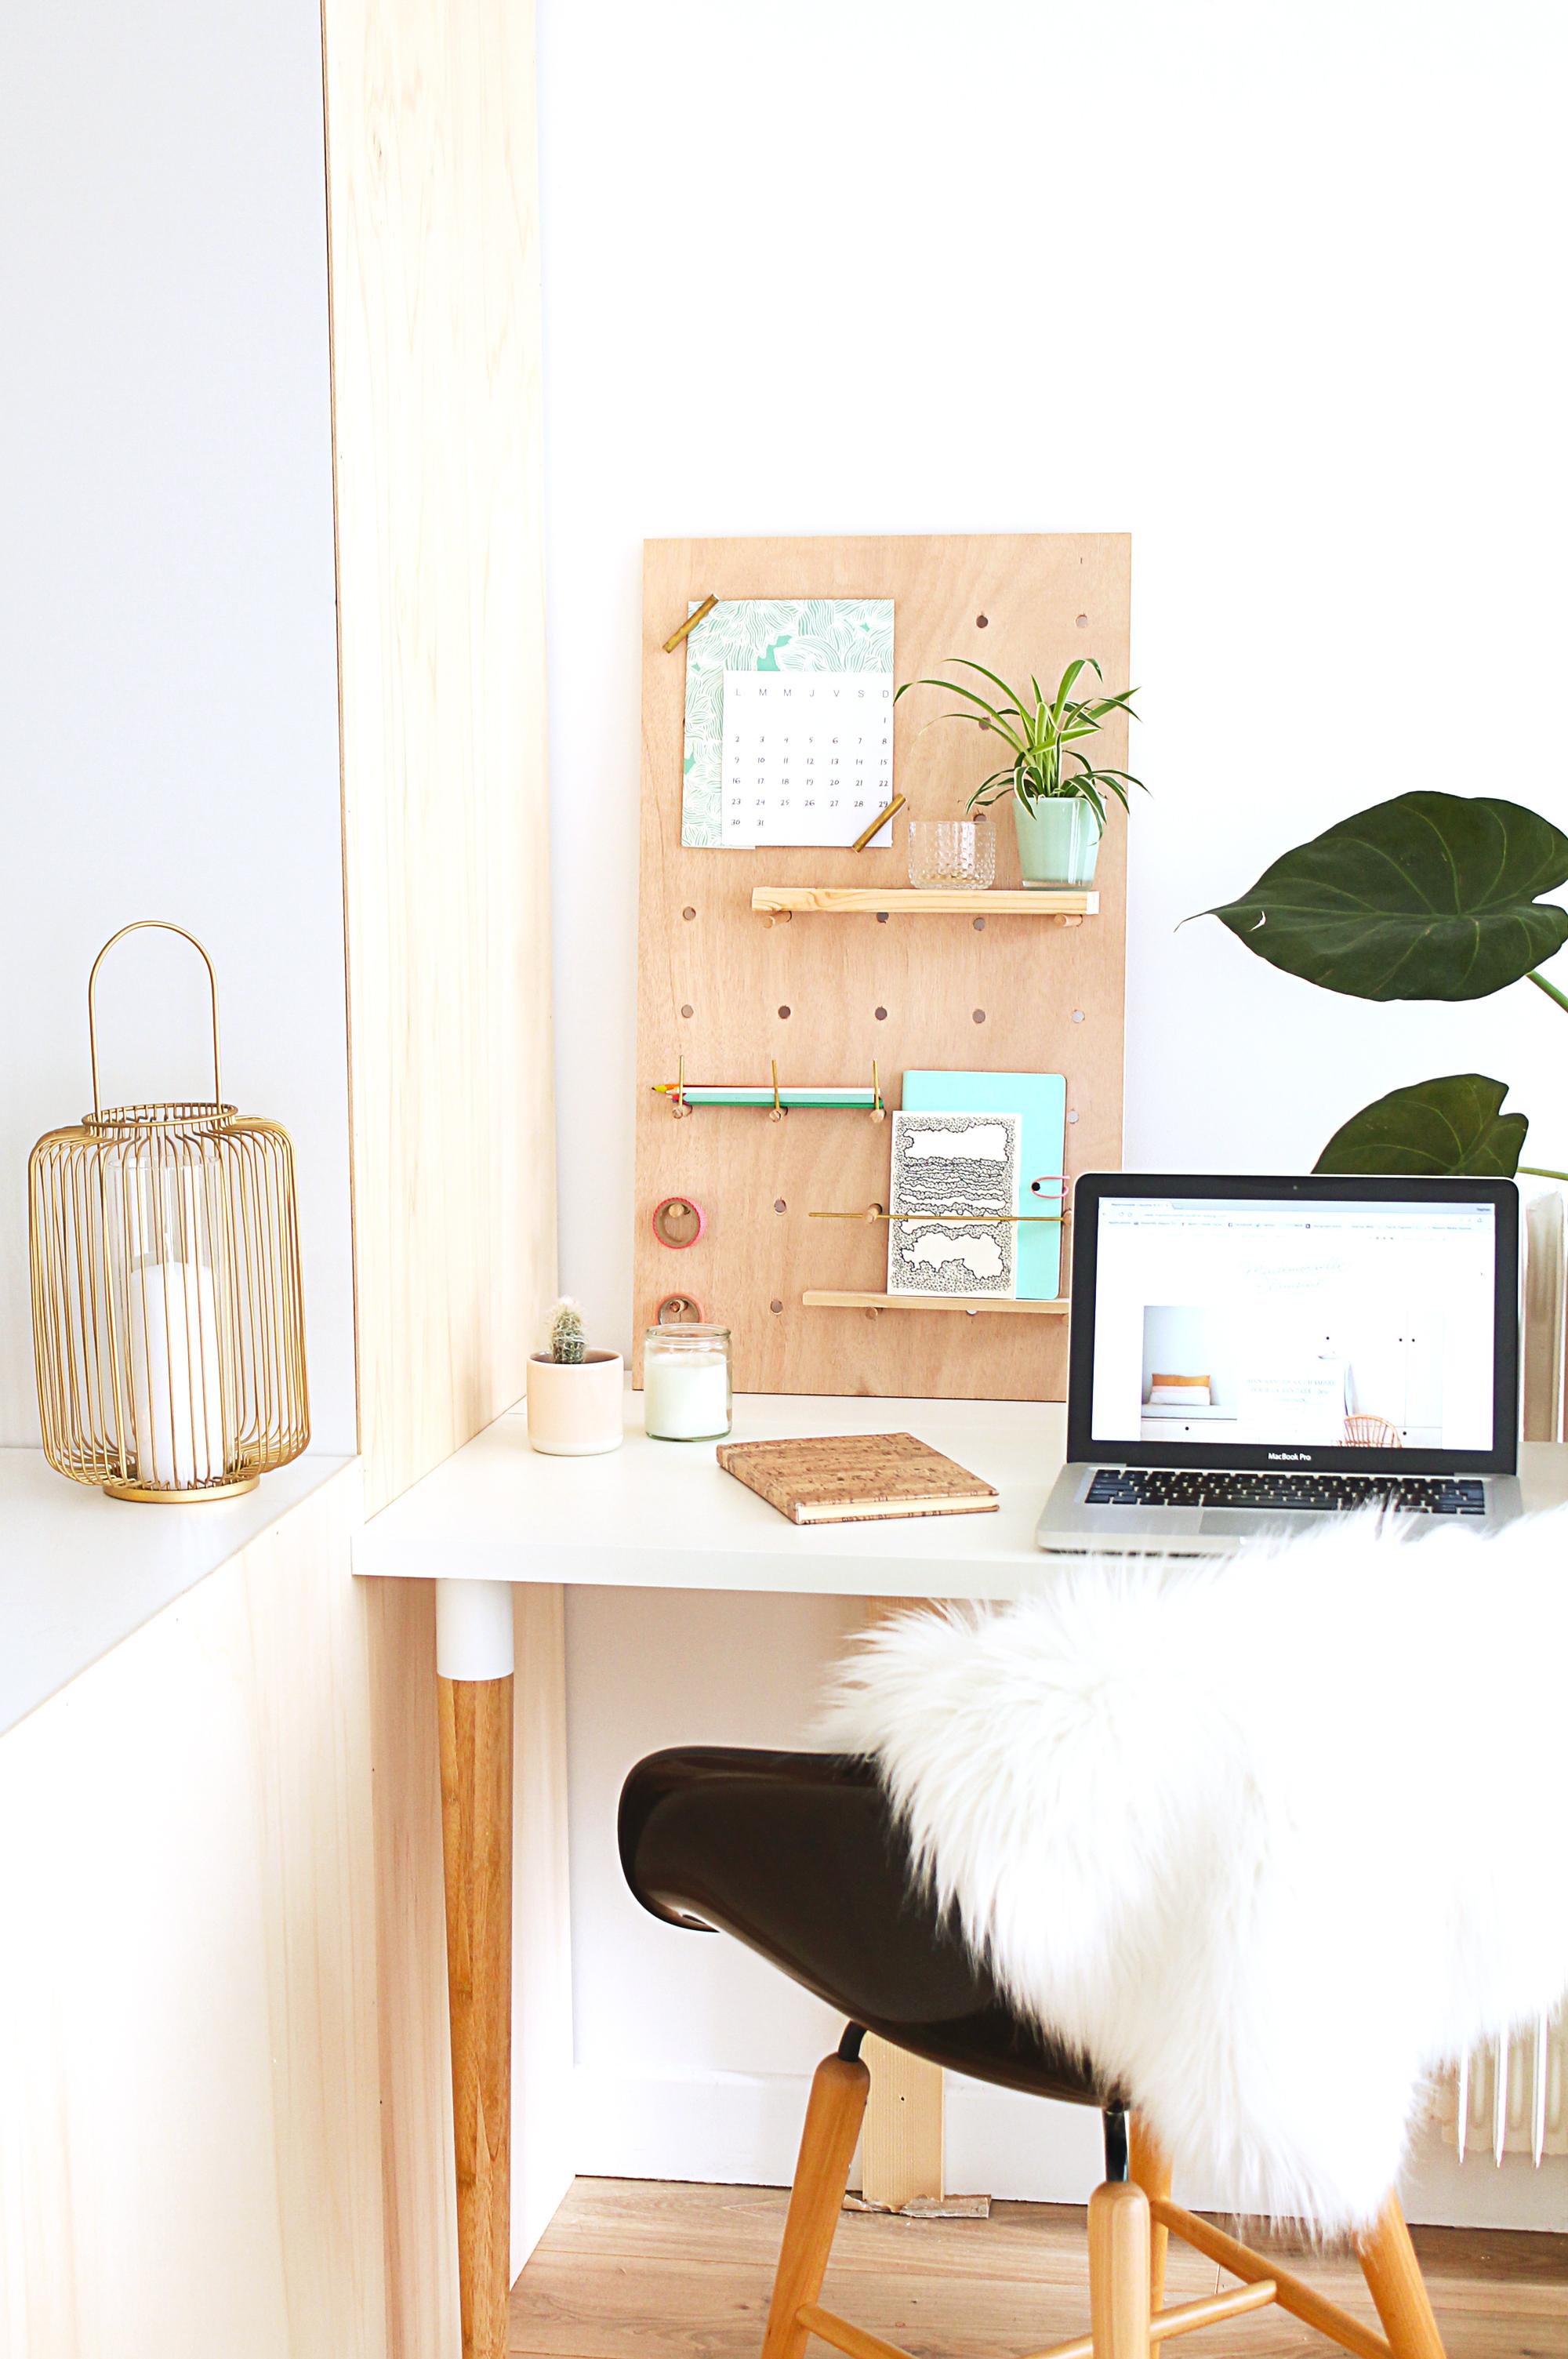 diy-peg-board-bureau-chaise noire mademoiselle claudine